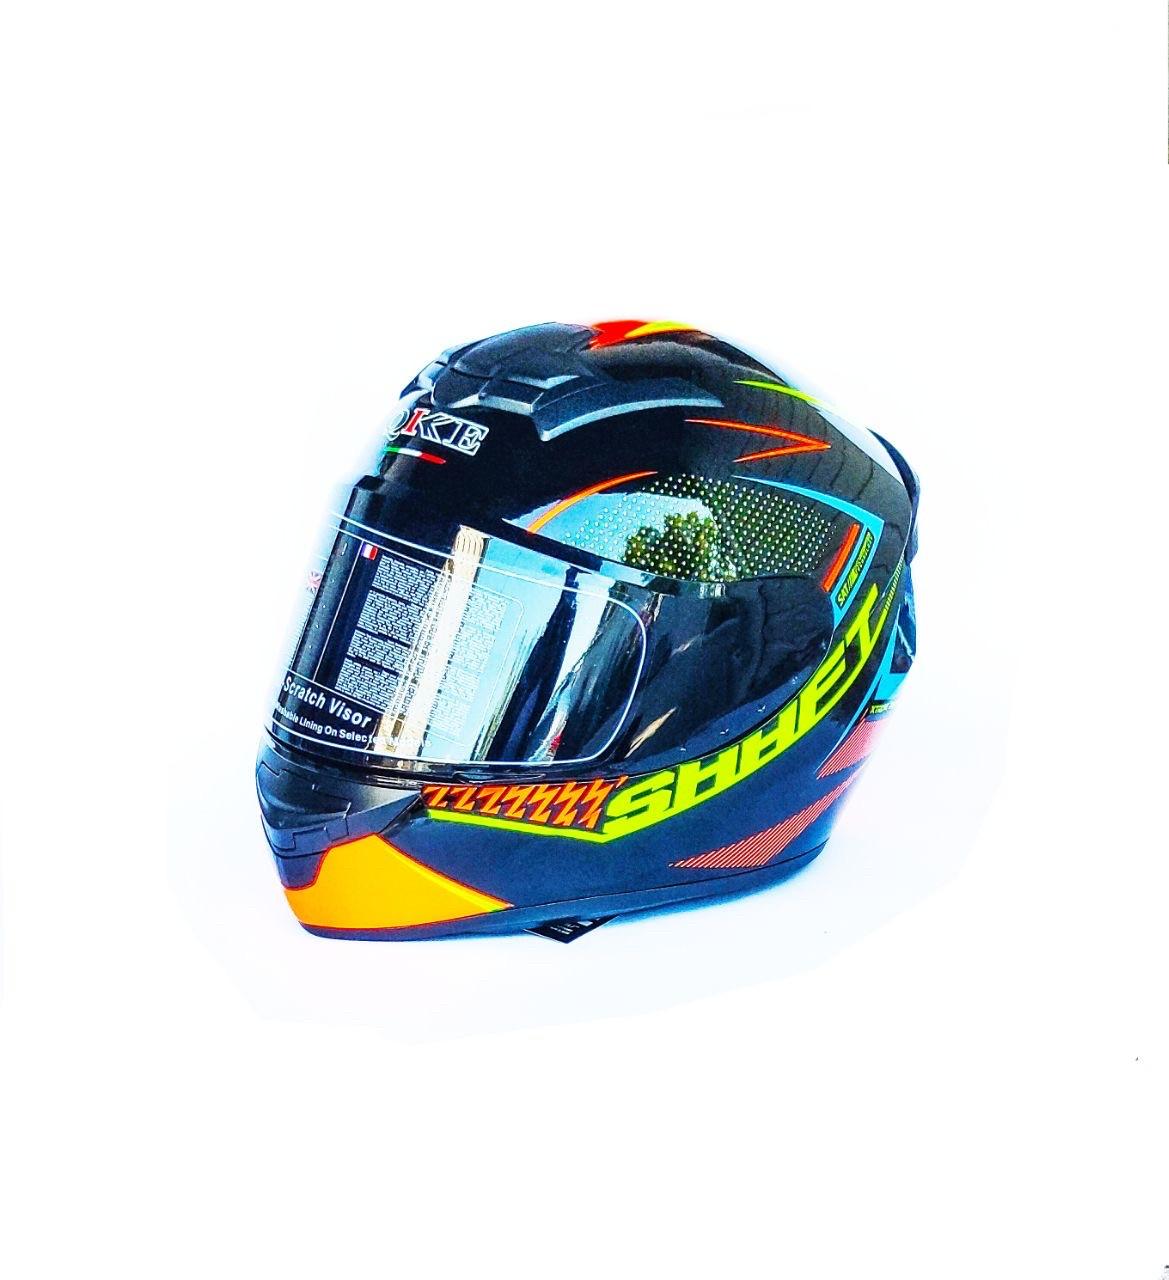 Мото-шлем SHHFT